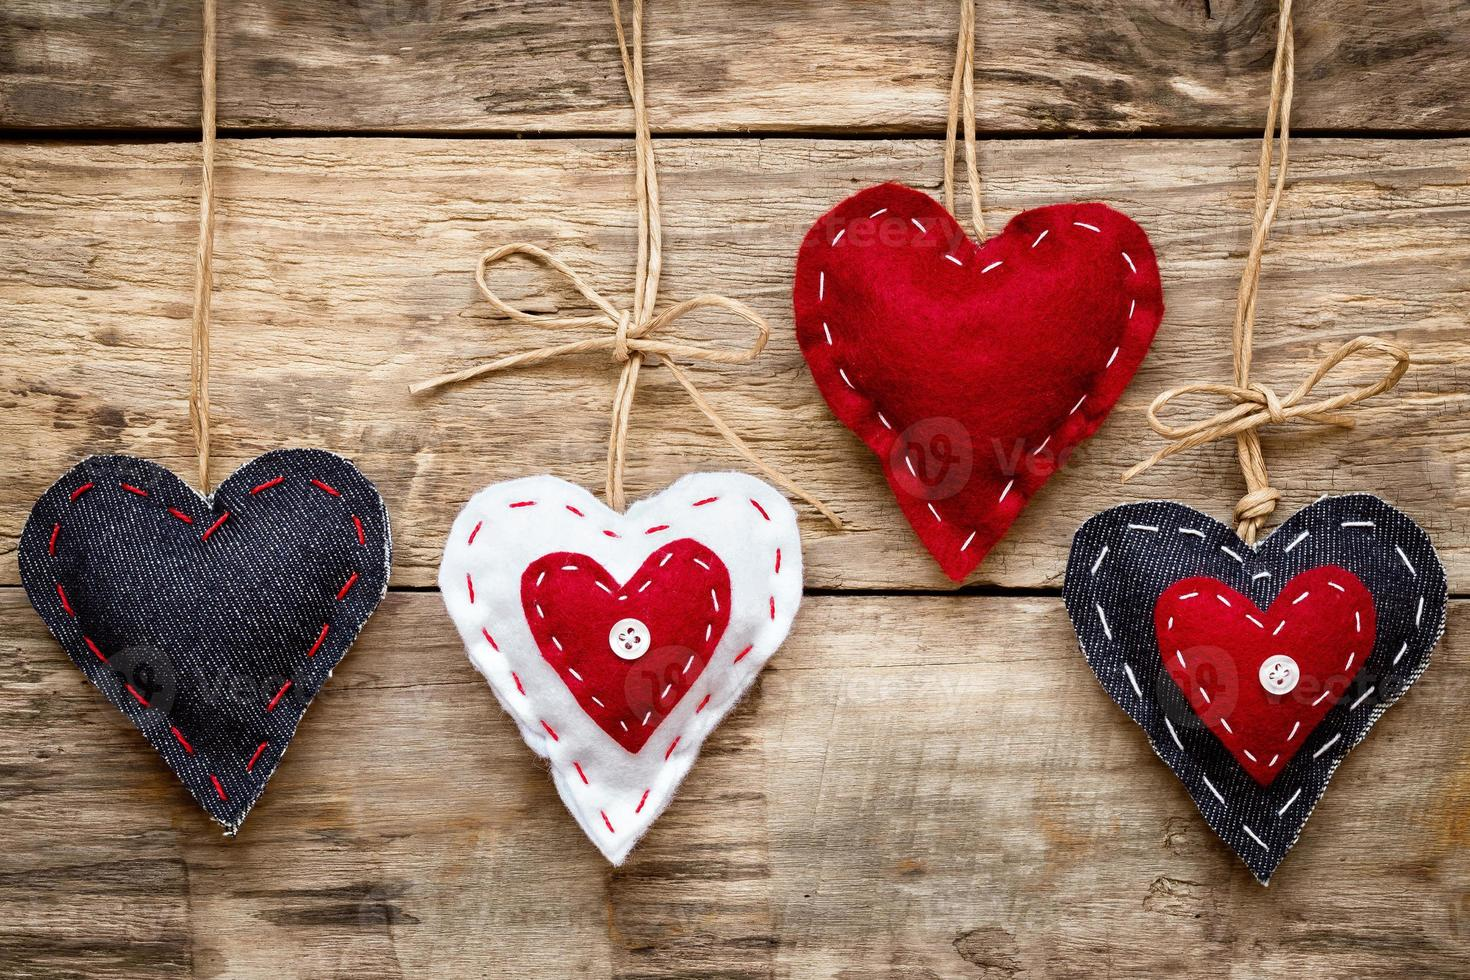 tarjeta de corazón de amor de san valentín foto